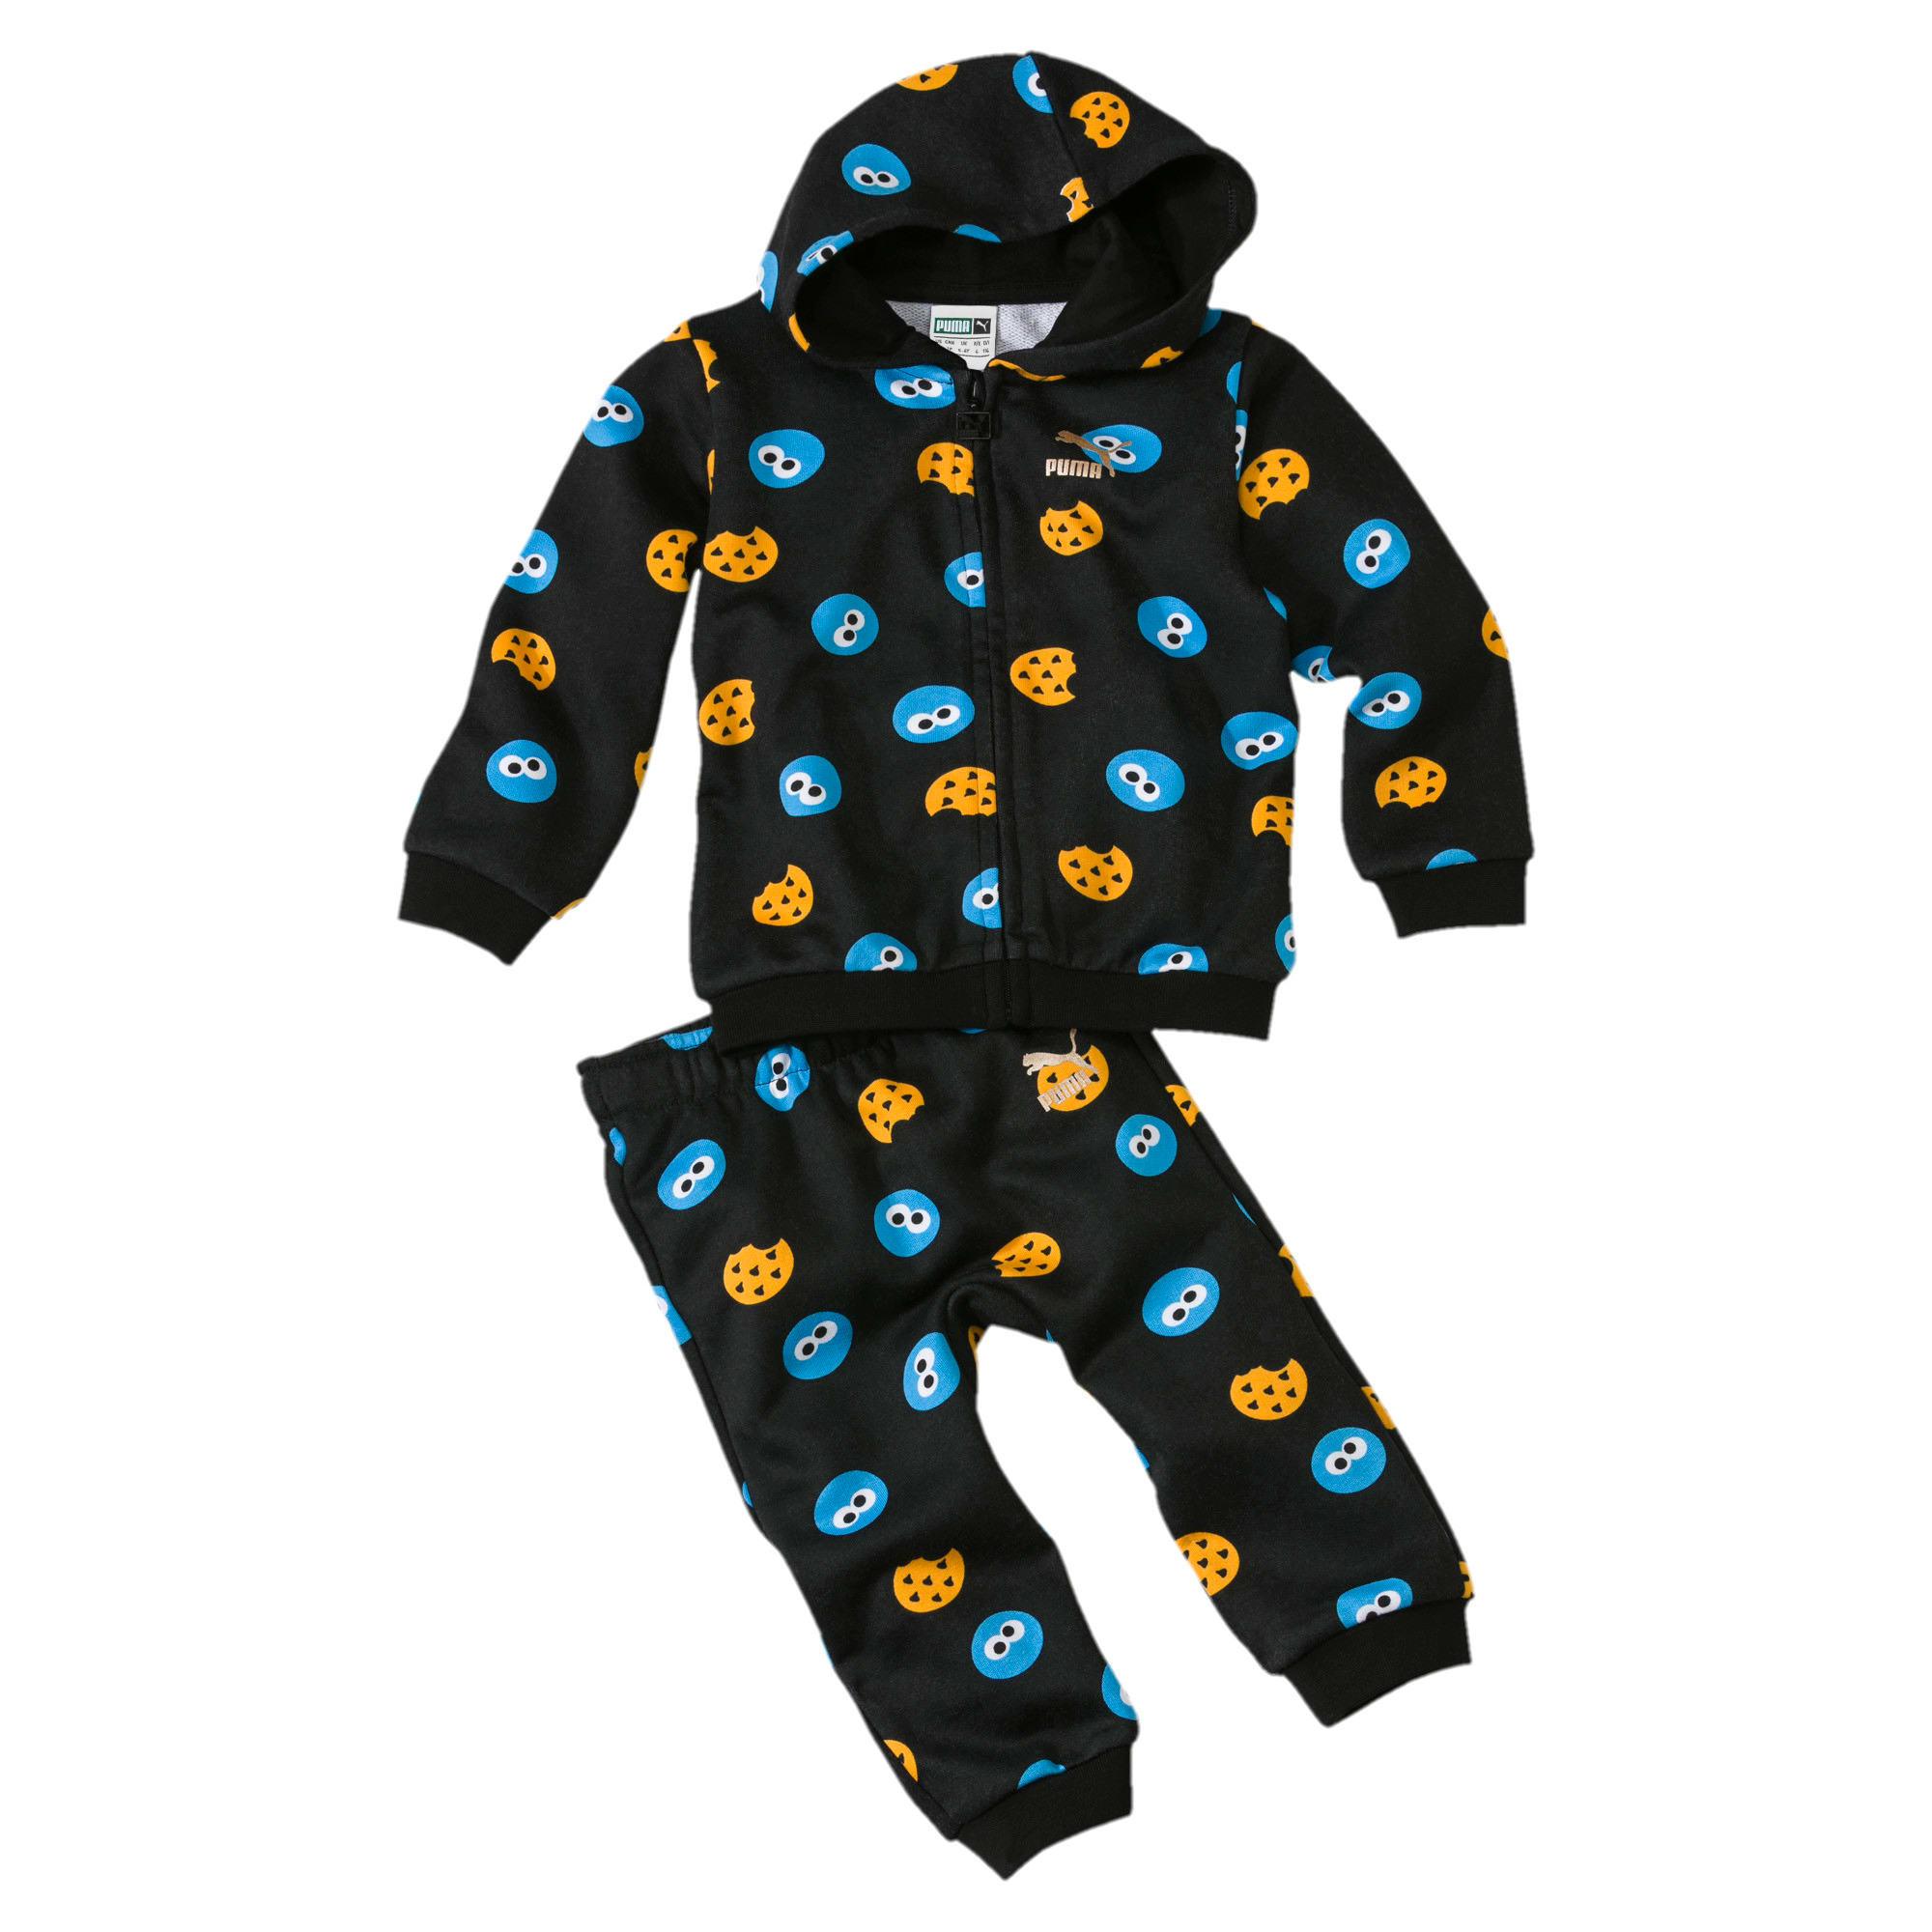 Thumbnail 1 of Sesame Street Graphic Babies' Jogger Set, Puma Black, medium